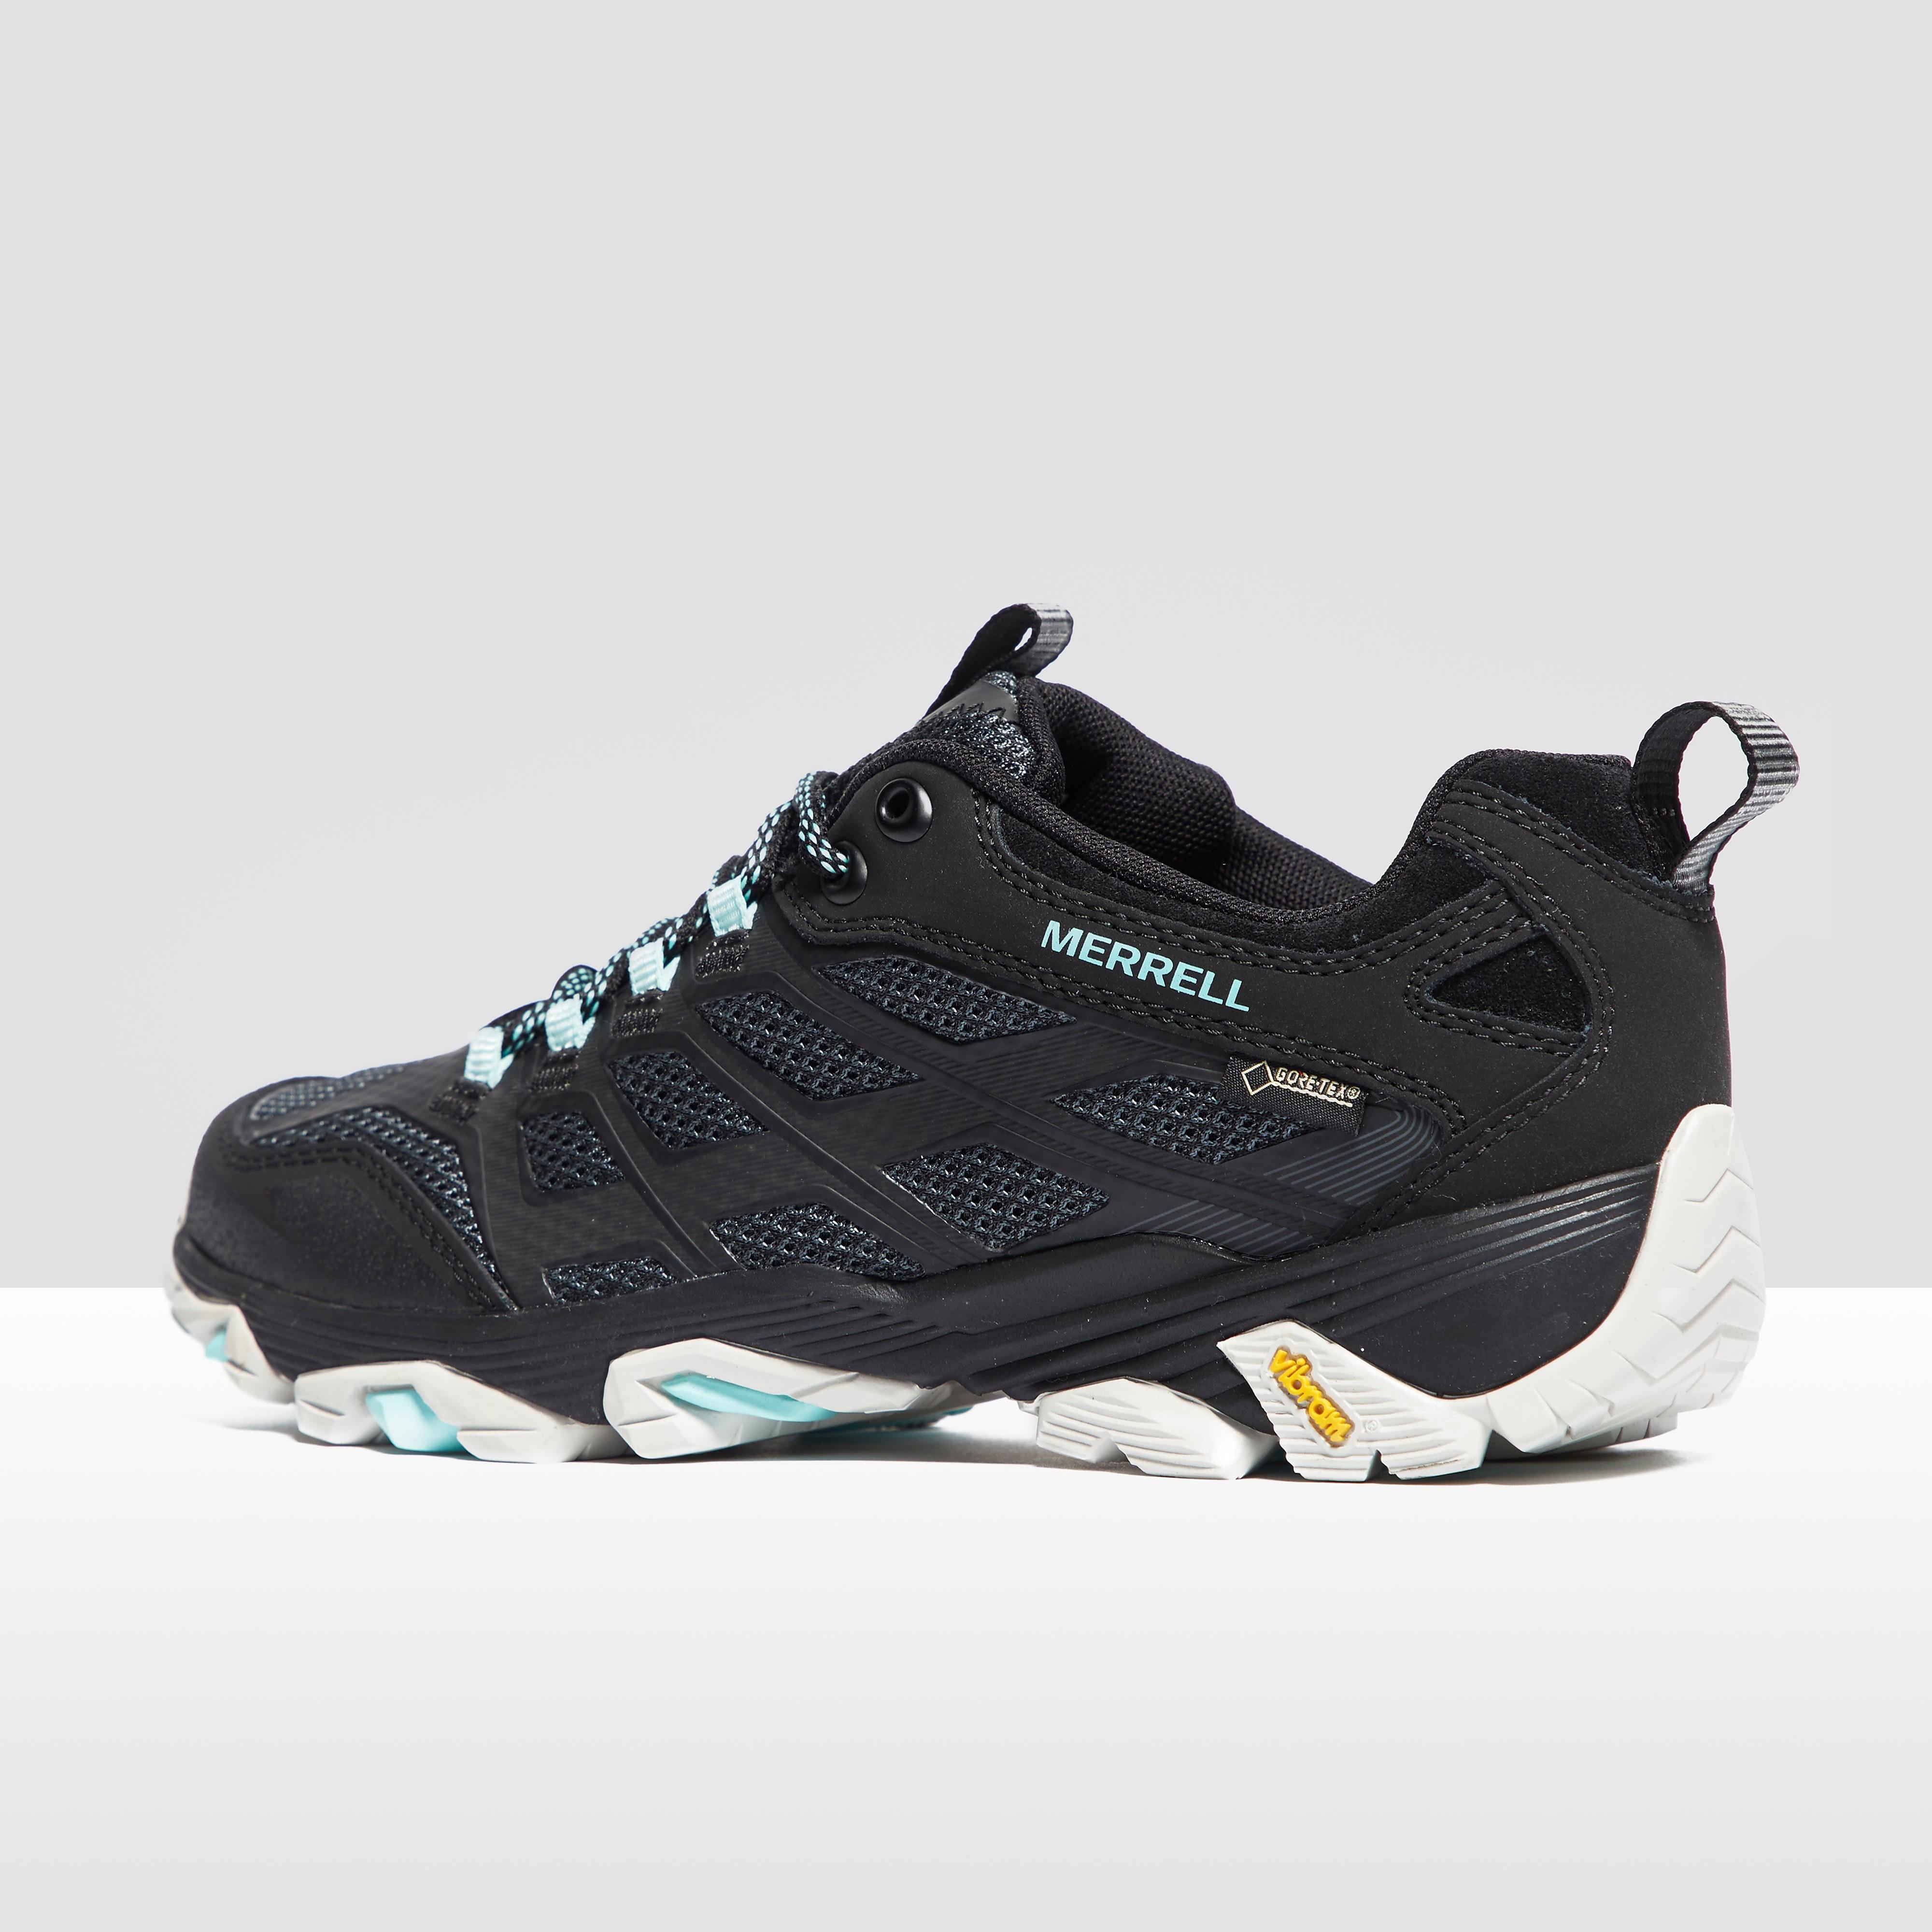 Merrell MOAB FST GORE-TEX Women's Walking Shoes